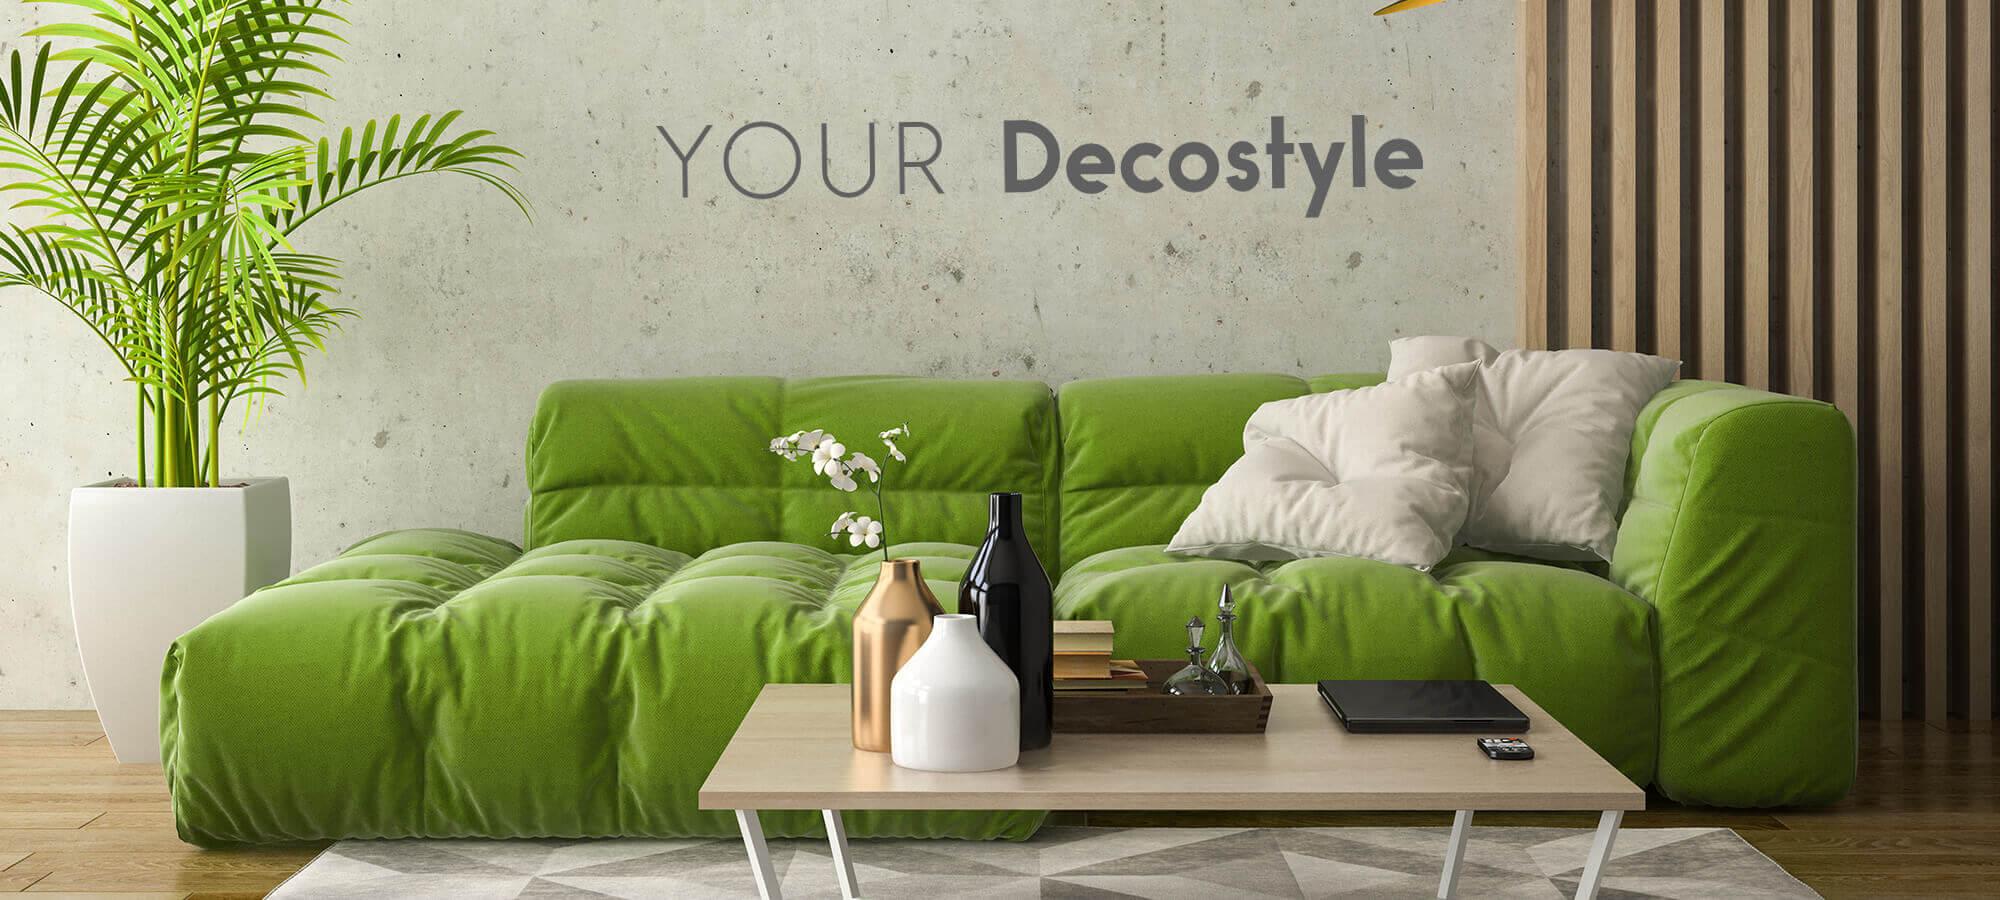 Decoratiuni Decodepot pentru casa ta.